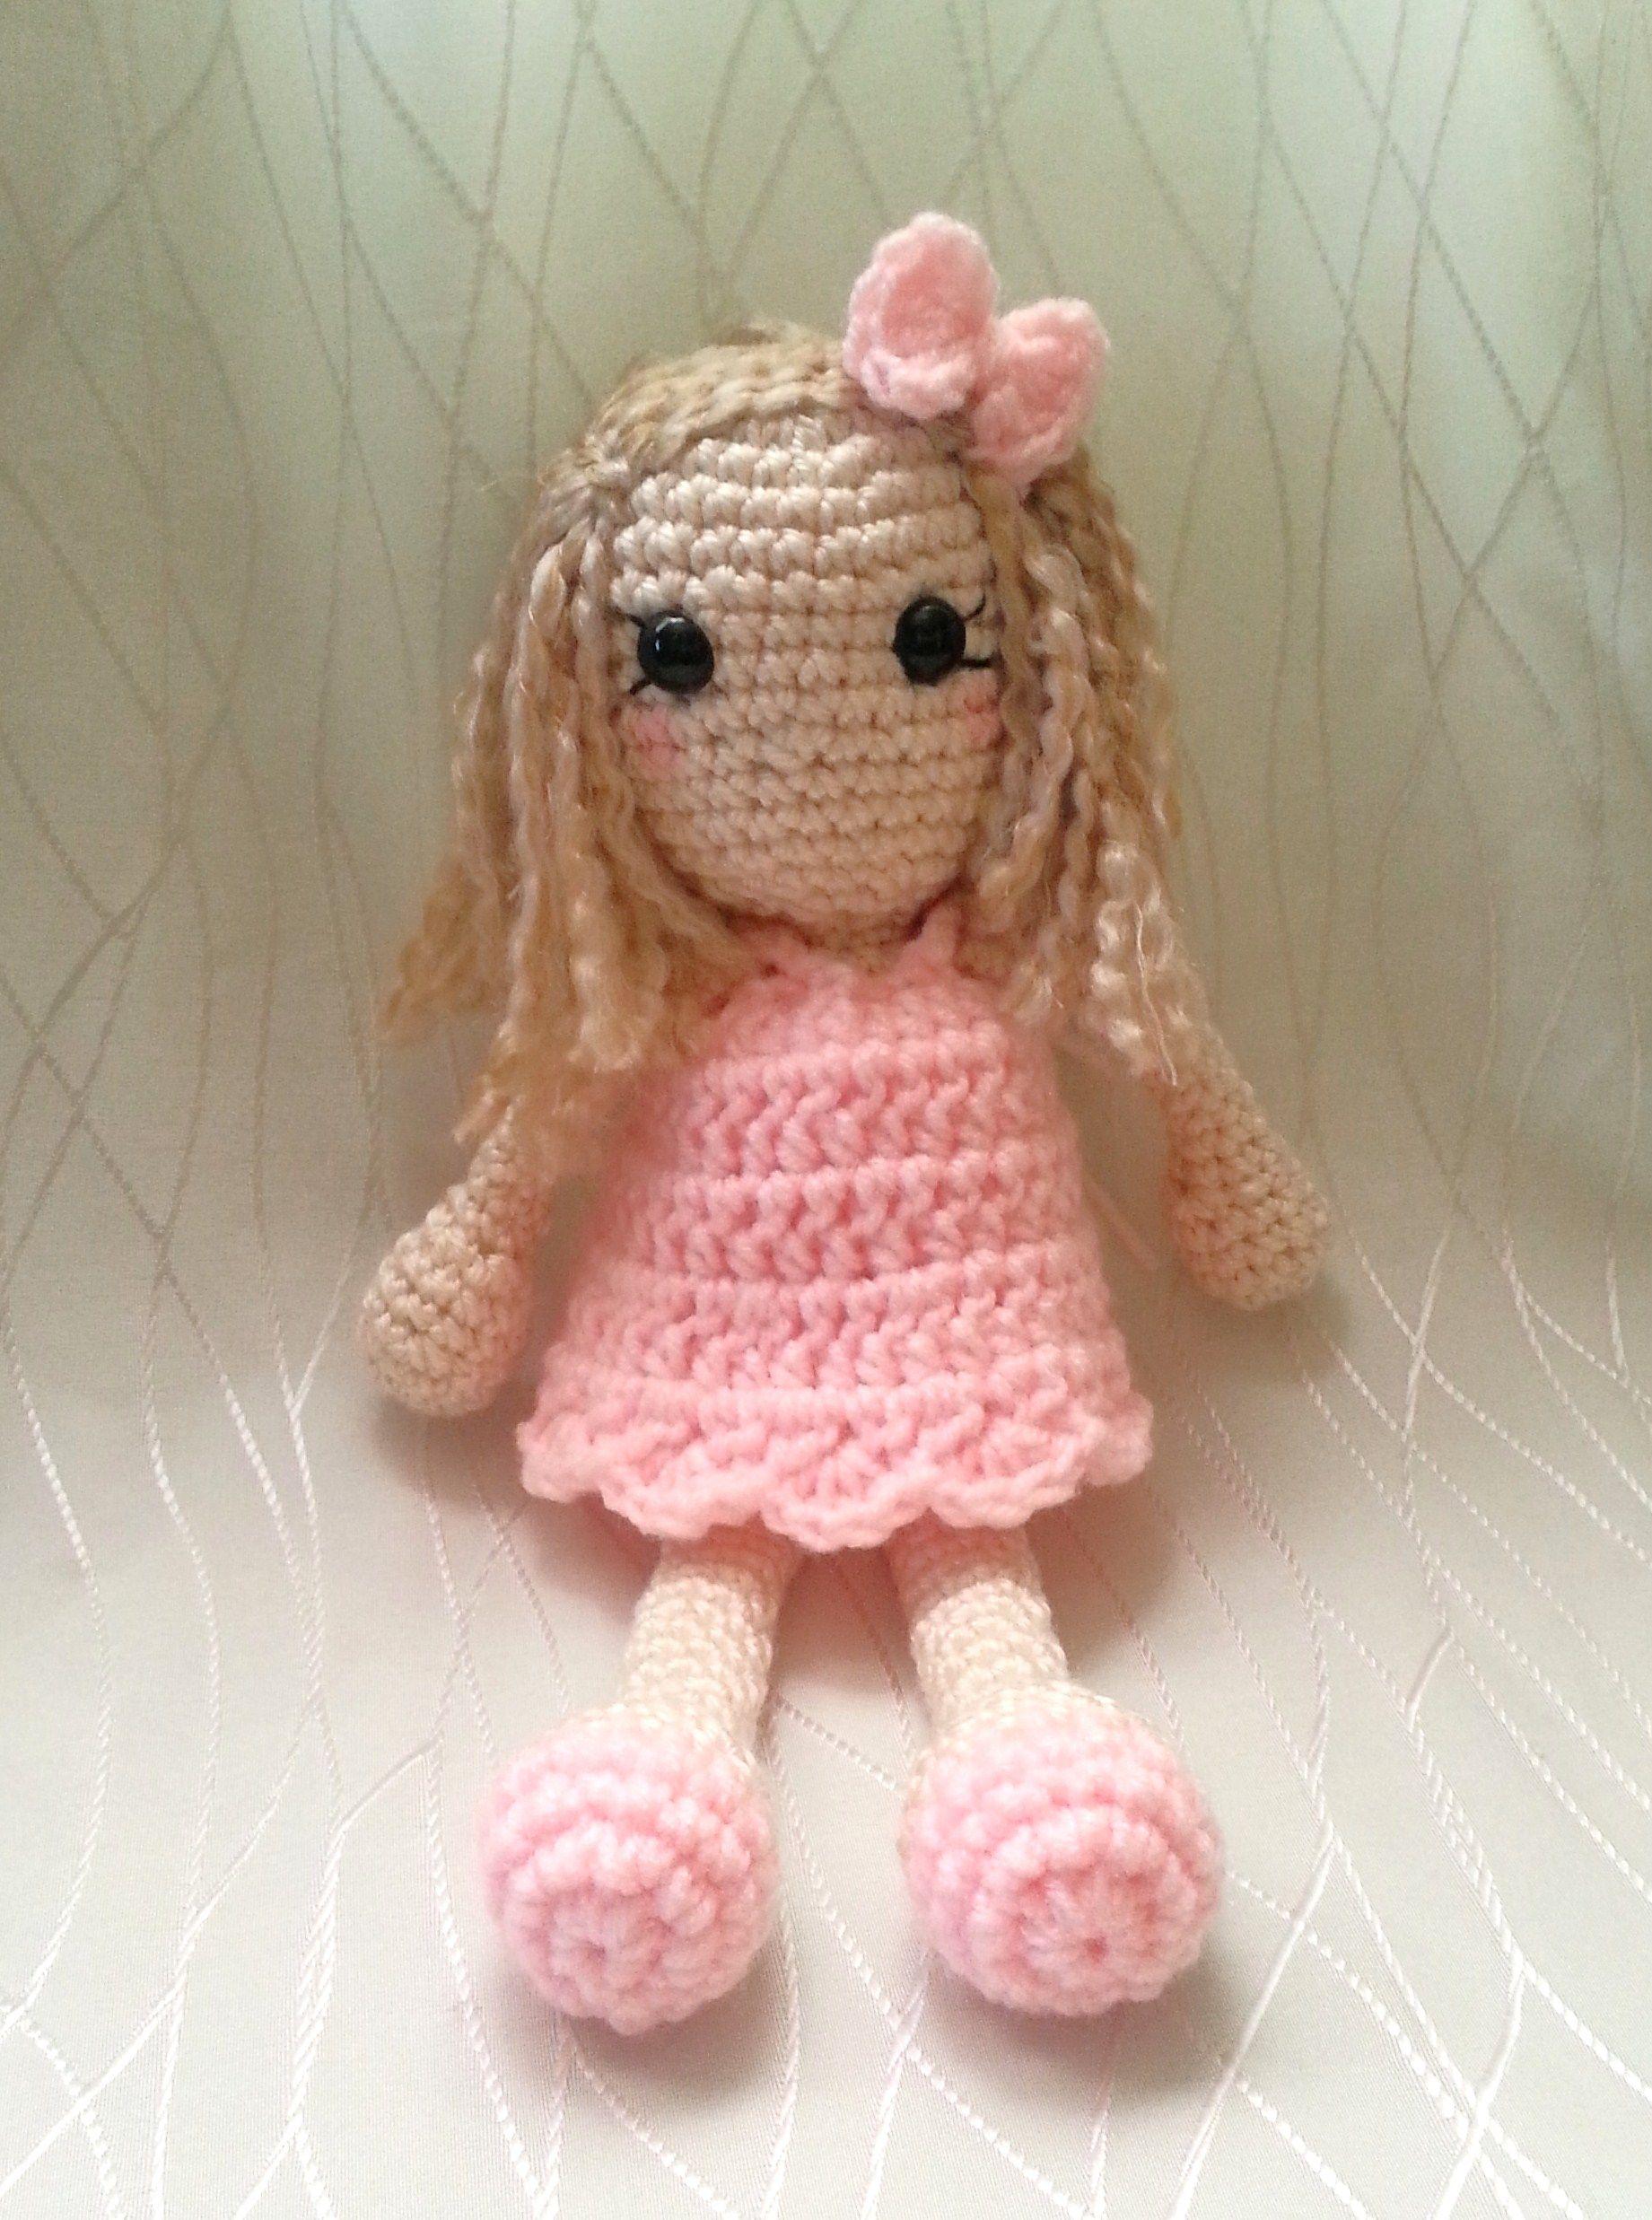 Amigurumi Dress Up Dolls : dress up amigurumi doll coocoo for crocheting Pinterest